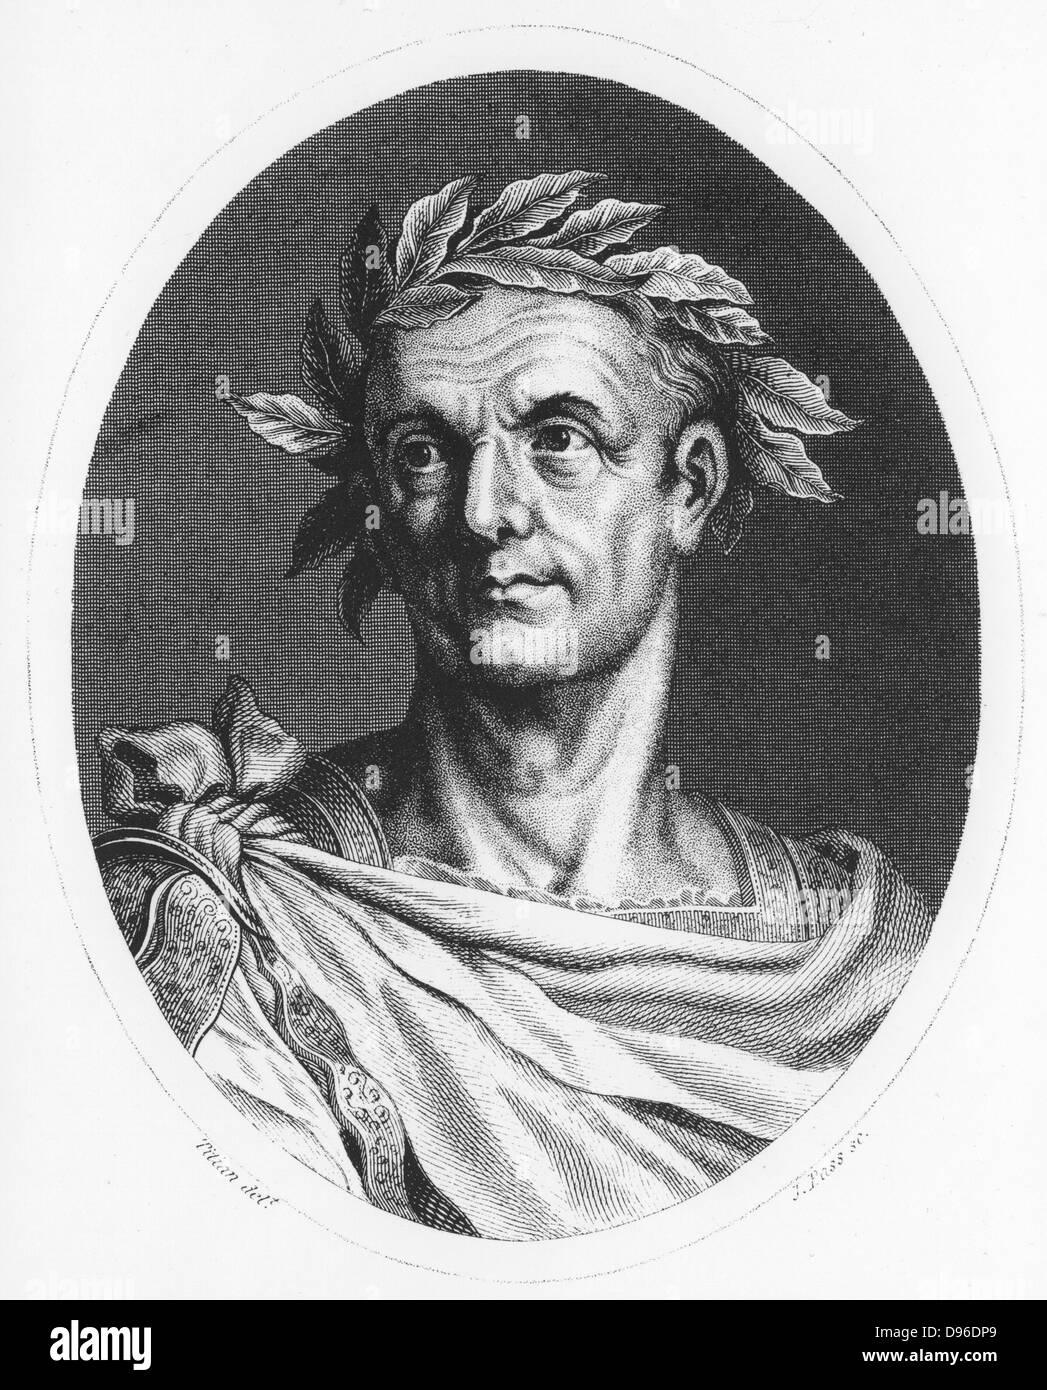 Julius Caesar (100-44 BC) Roman soldier and statesman. Engraving c1825. - Stock Image